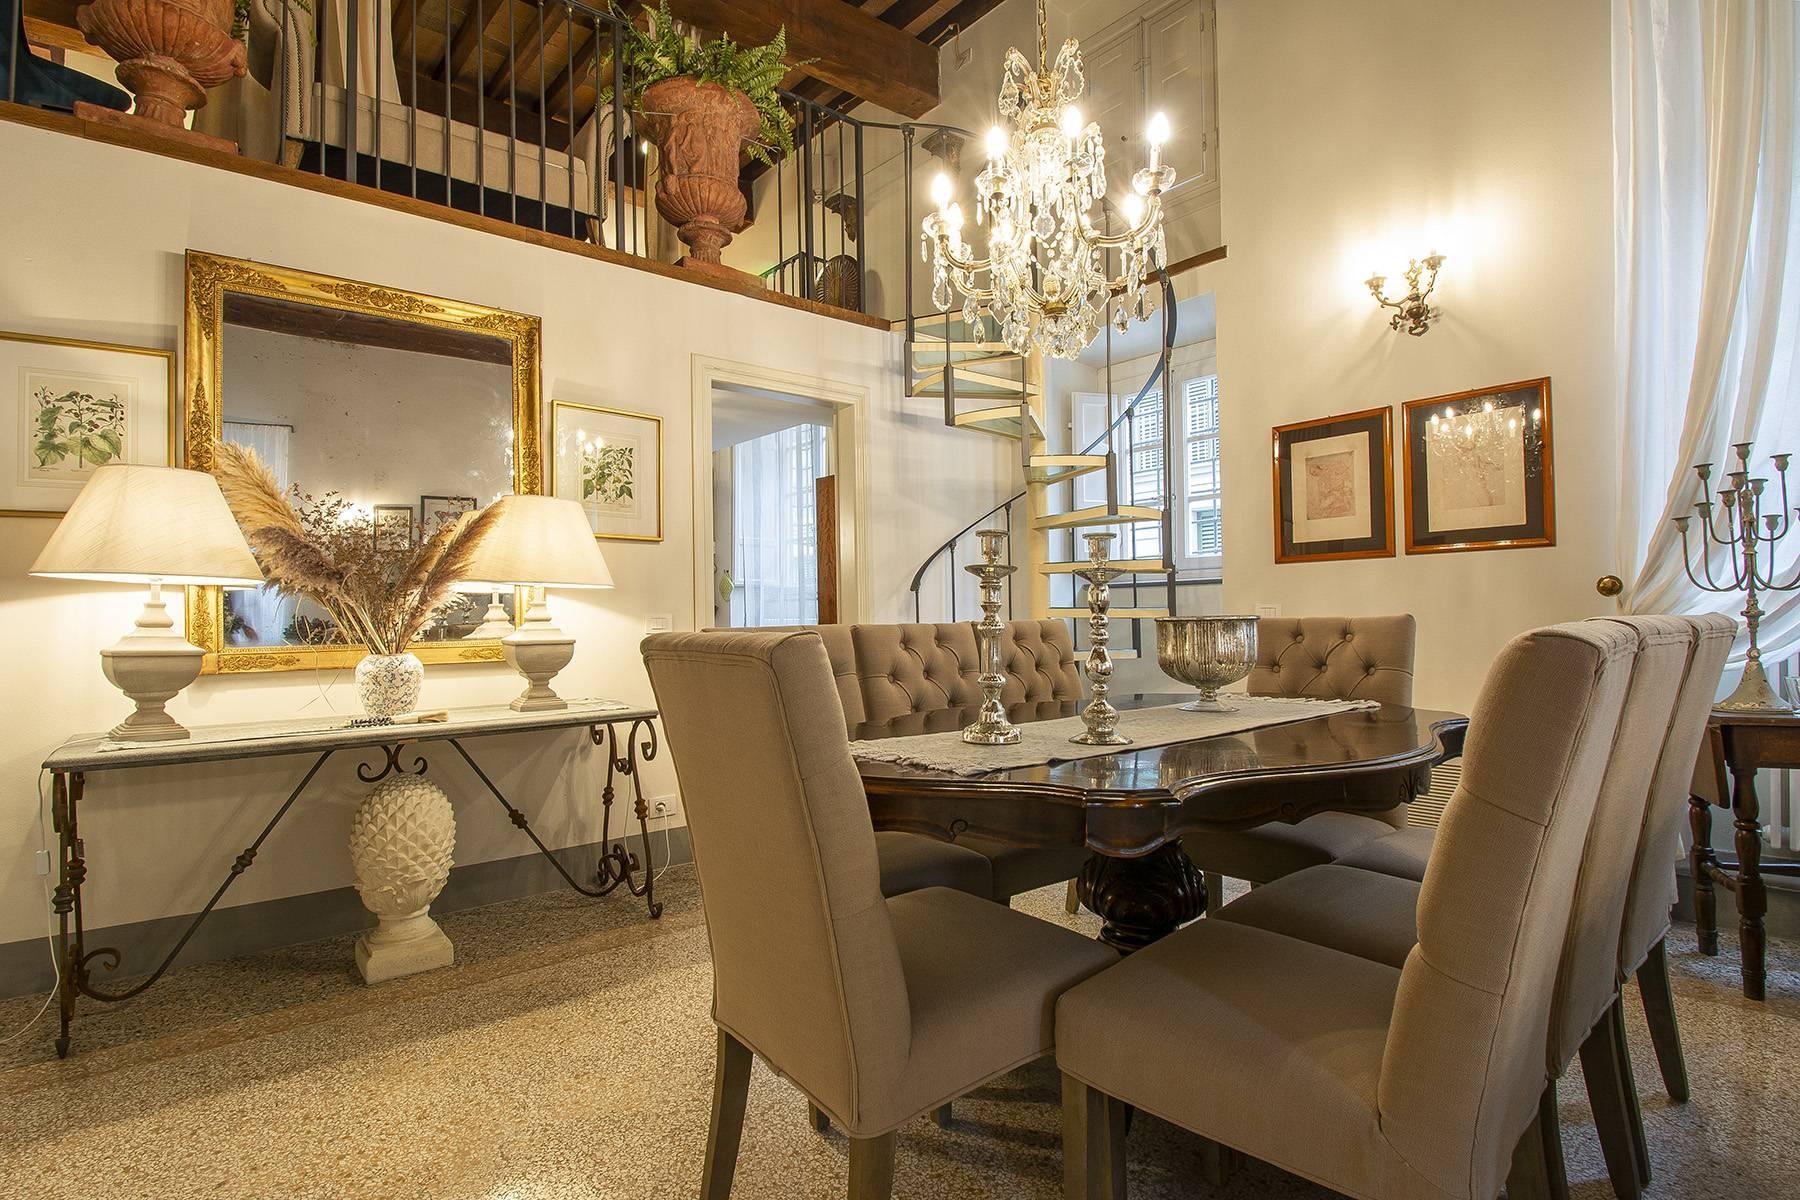 Appartement exclusif au coeur de Lucca - 5